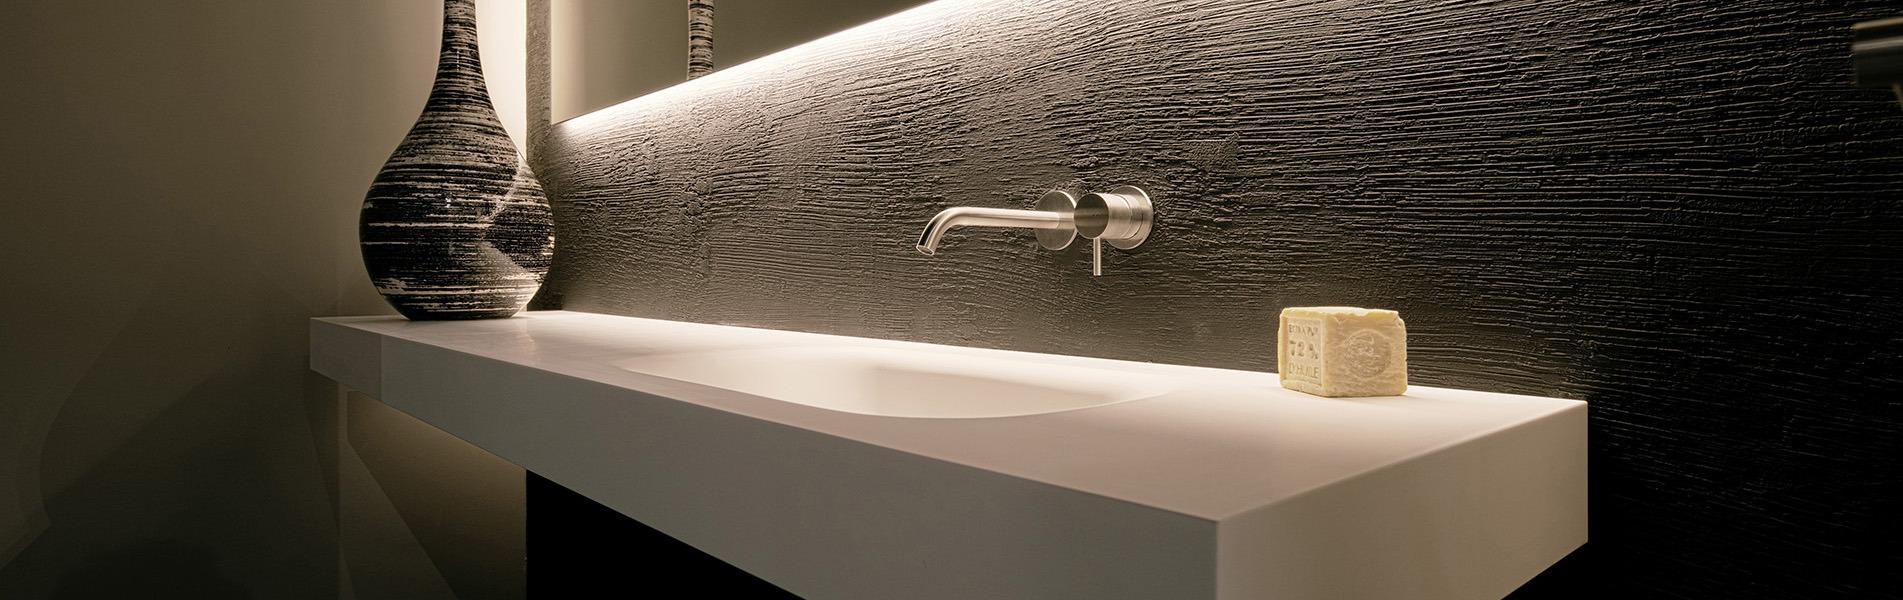 Design corian wastafels BDutch. BDutch, moderne design badkamer concepten.